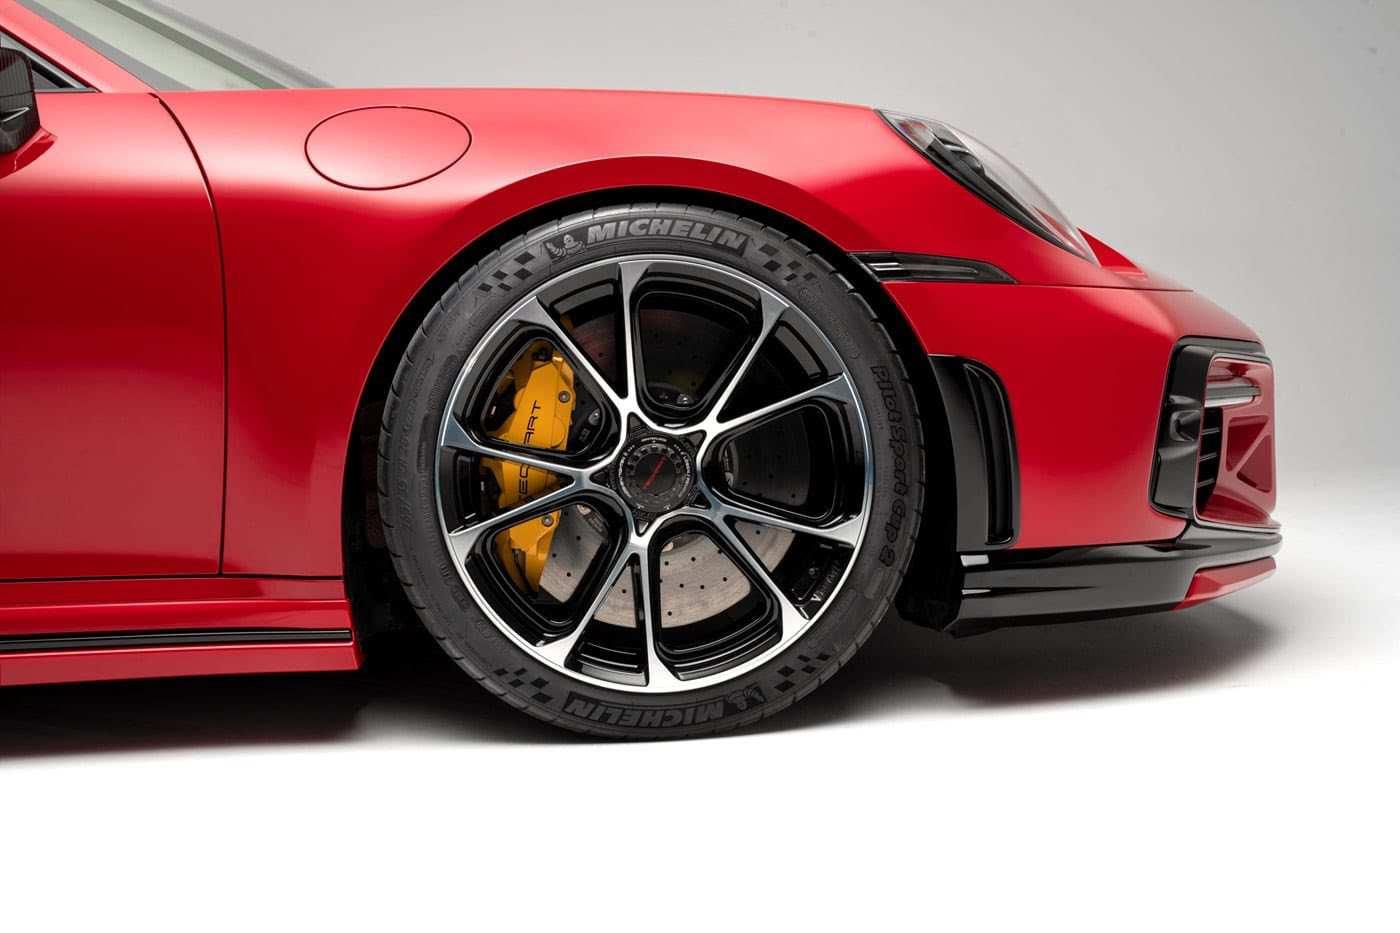 2021_Porsche_911_Turbo_S_by_TechArt_0005